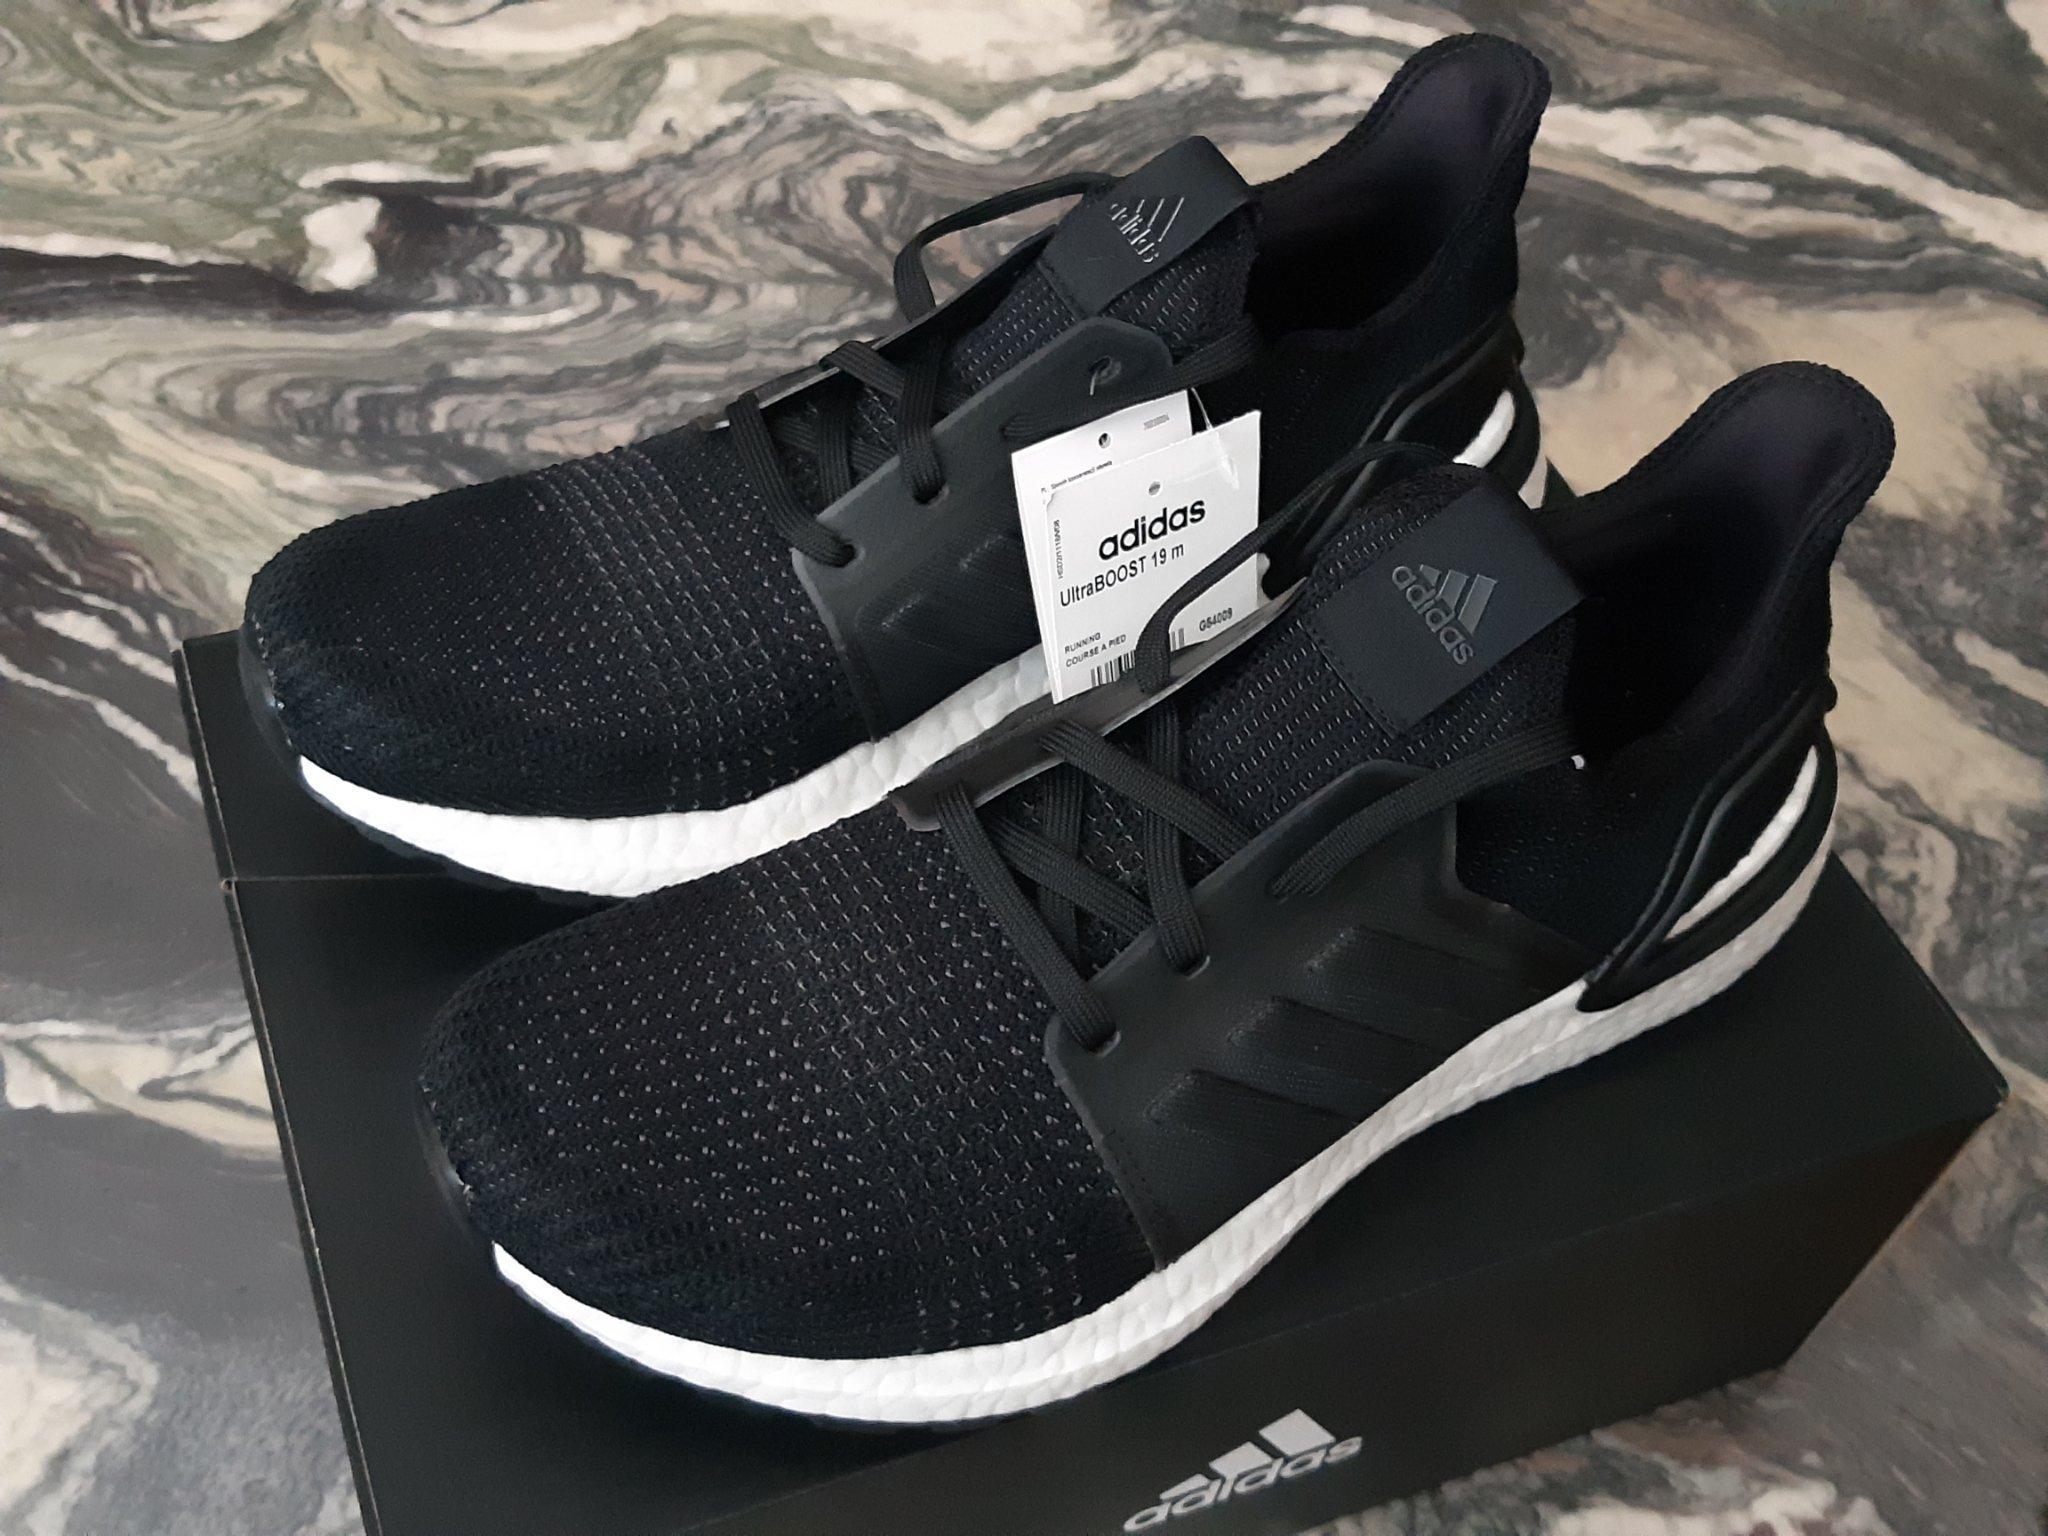 helt svarta sneakers